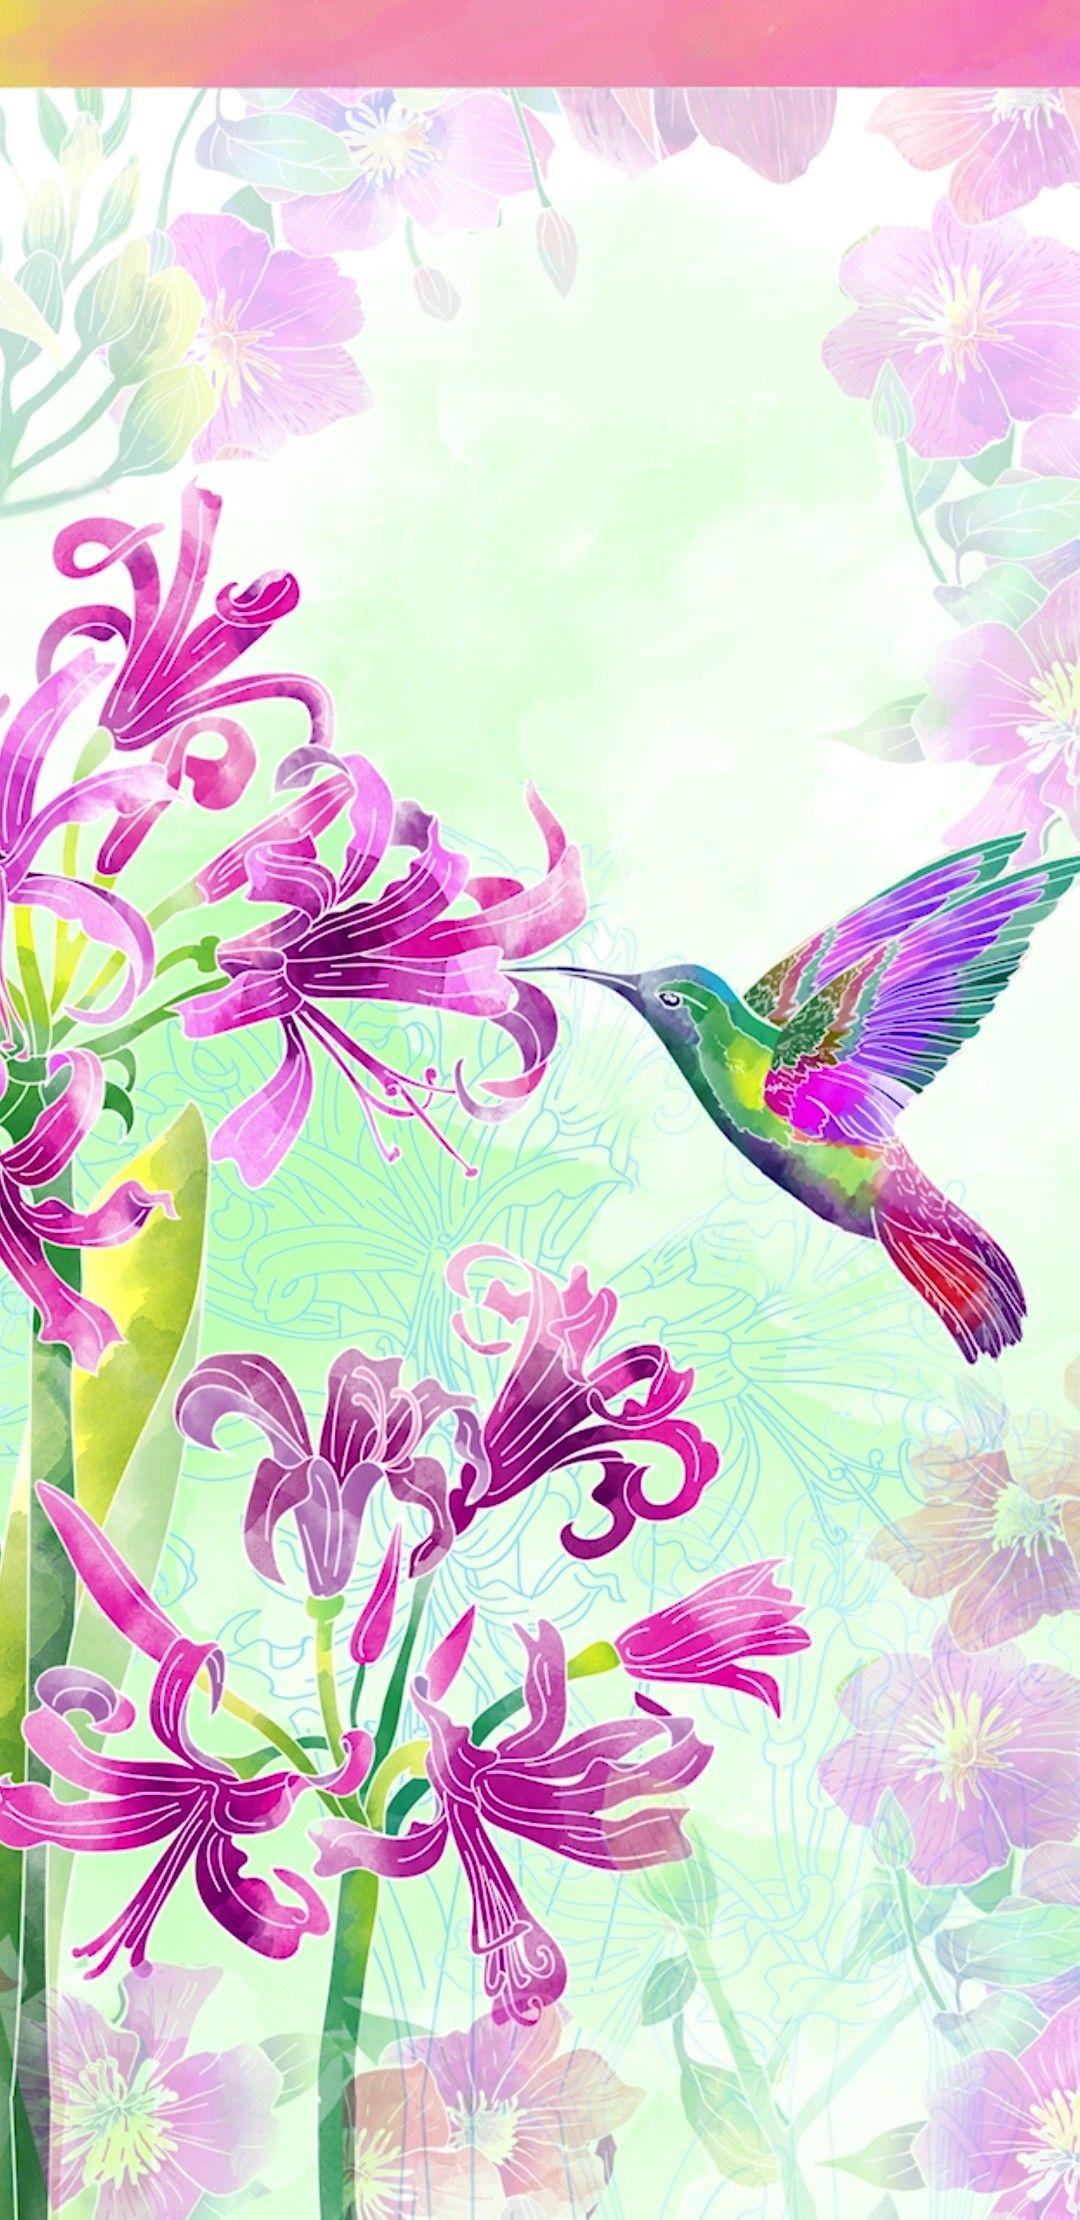 Wallpaper By Artist Unknown Hummingbird Wallpaper Plain Wallpaper Iphone Flowery Wallpaper